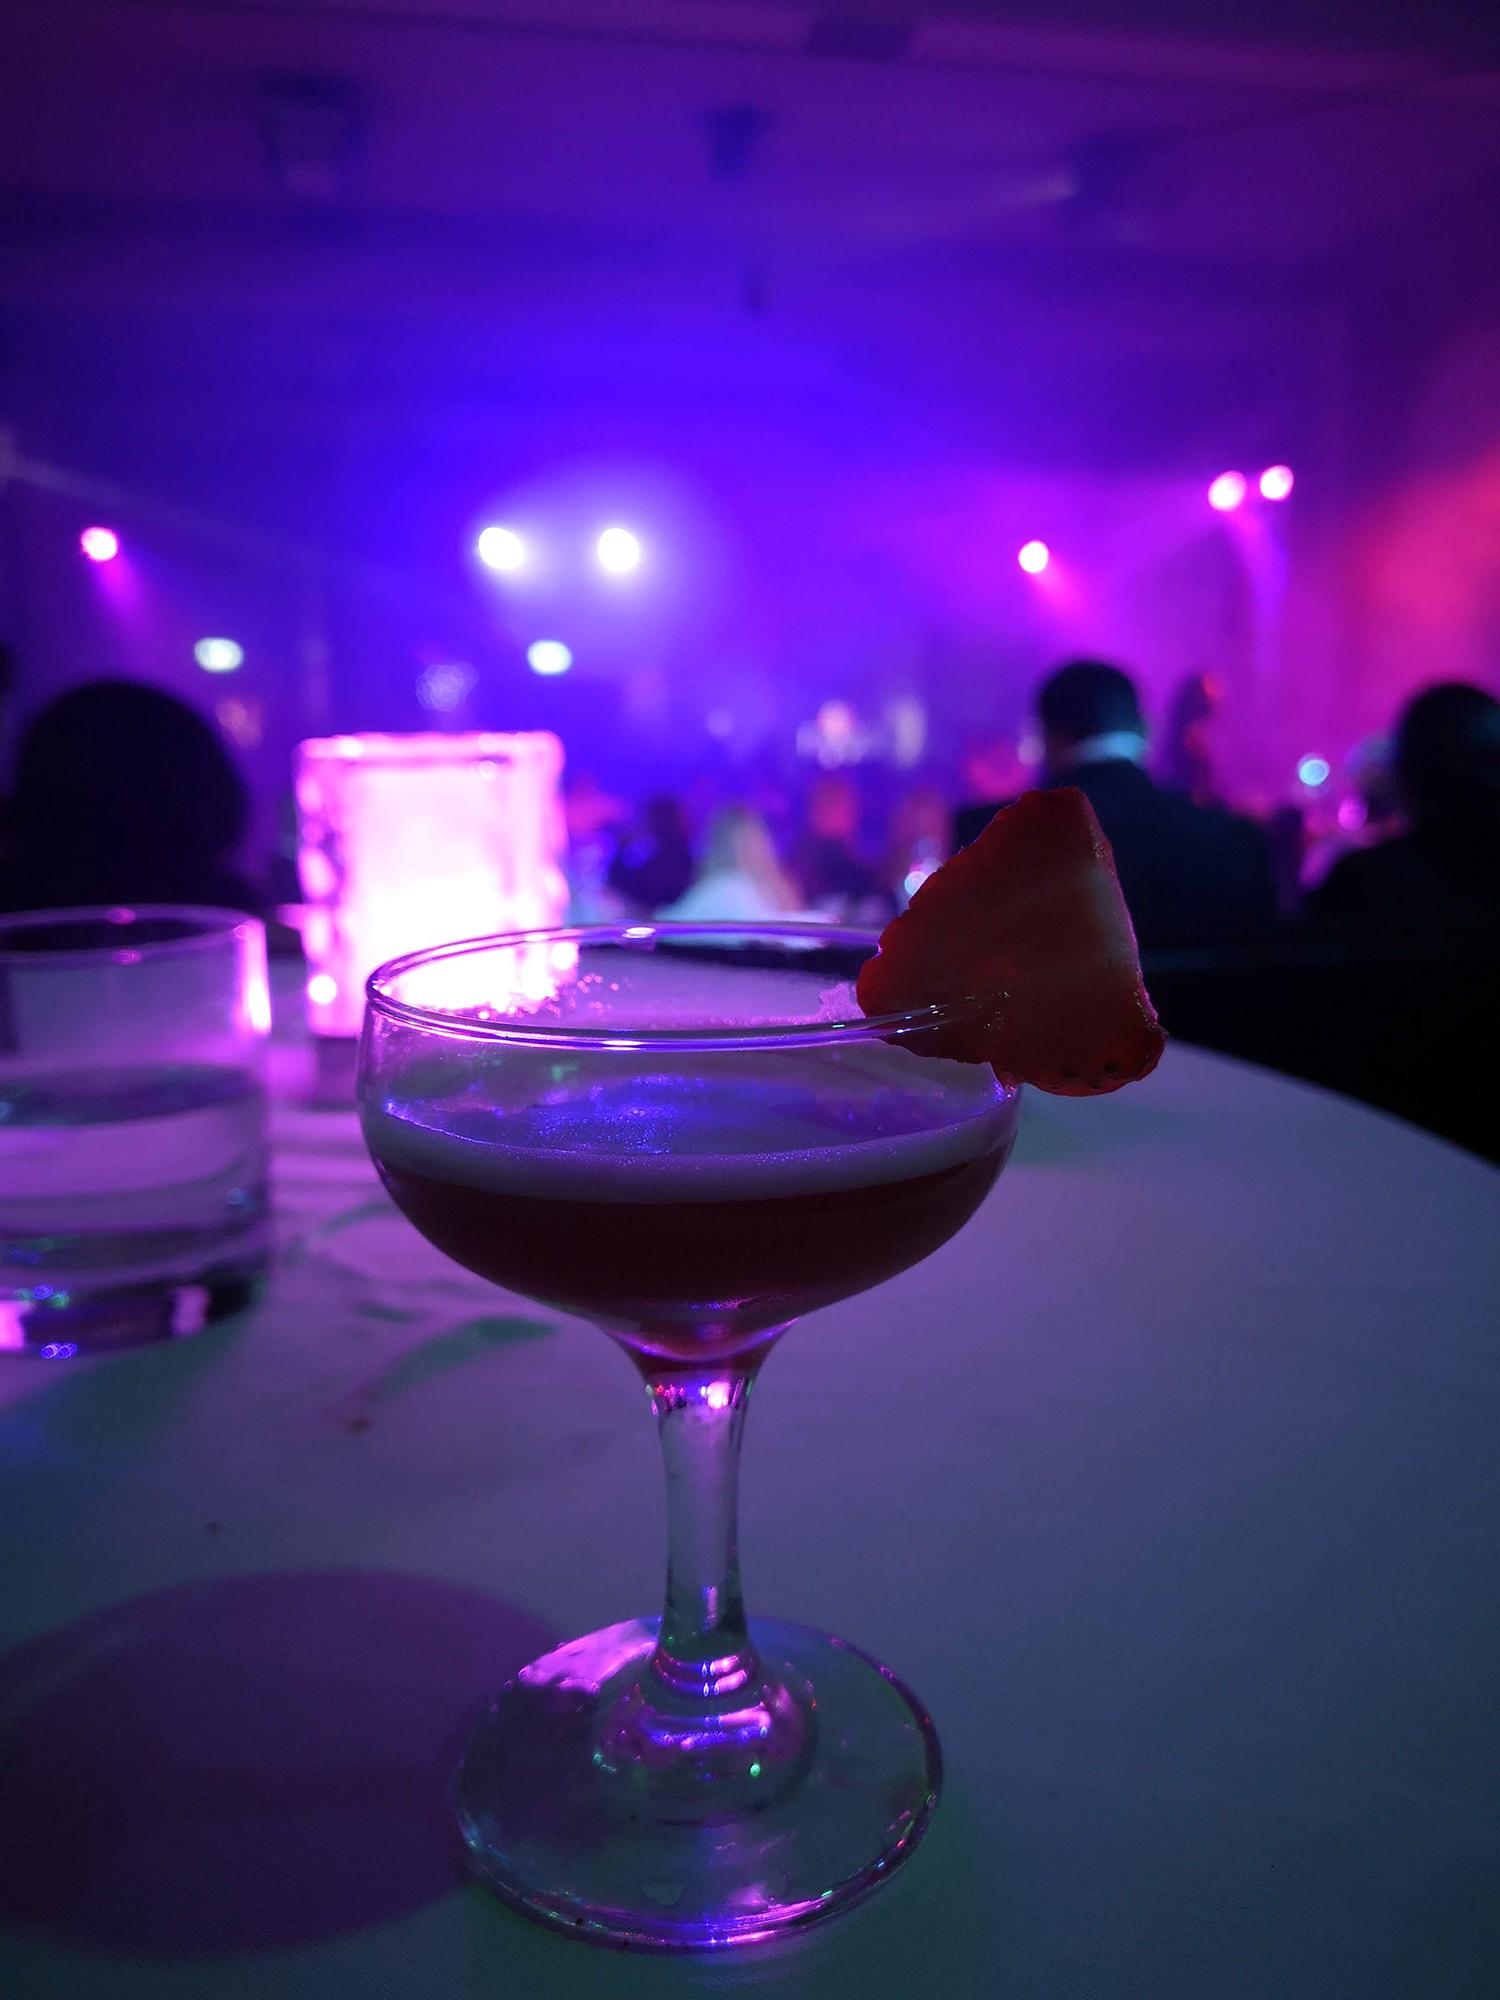 London_Cabaret_Club_London_Never_Dies_Cocktail